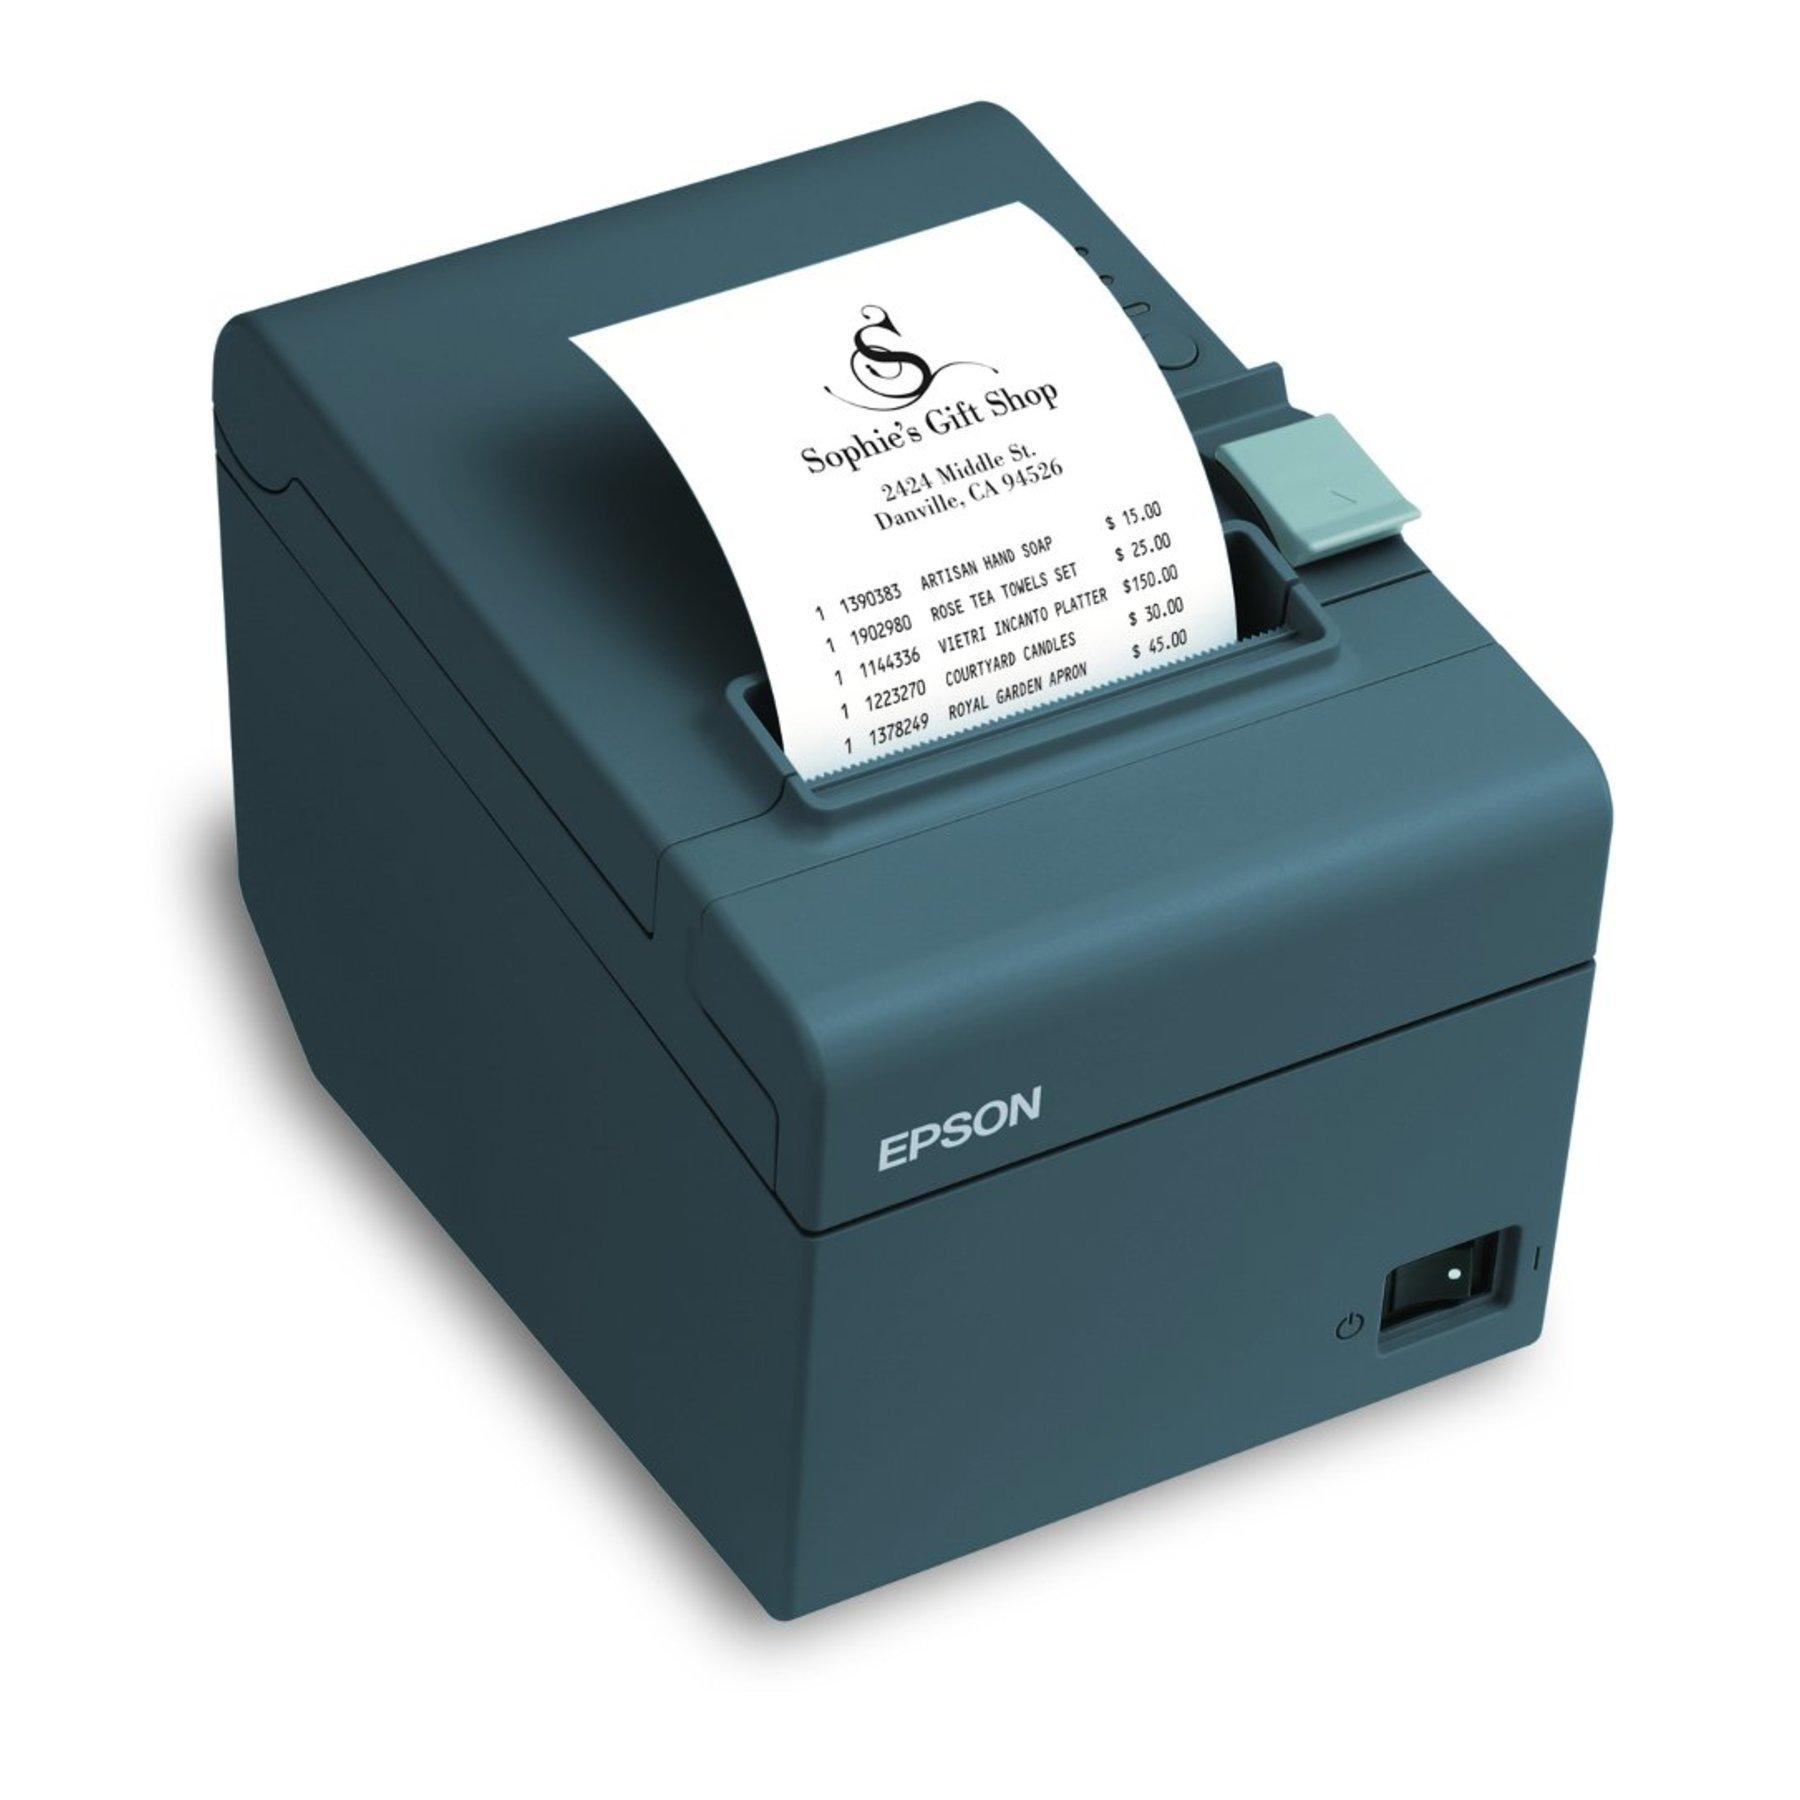 Epson Tm T20ii Receipt Printer Cash Drawers Ireland